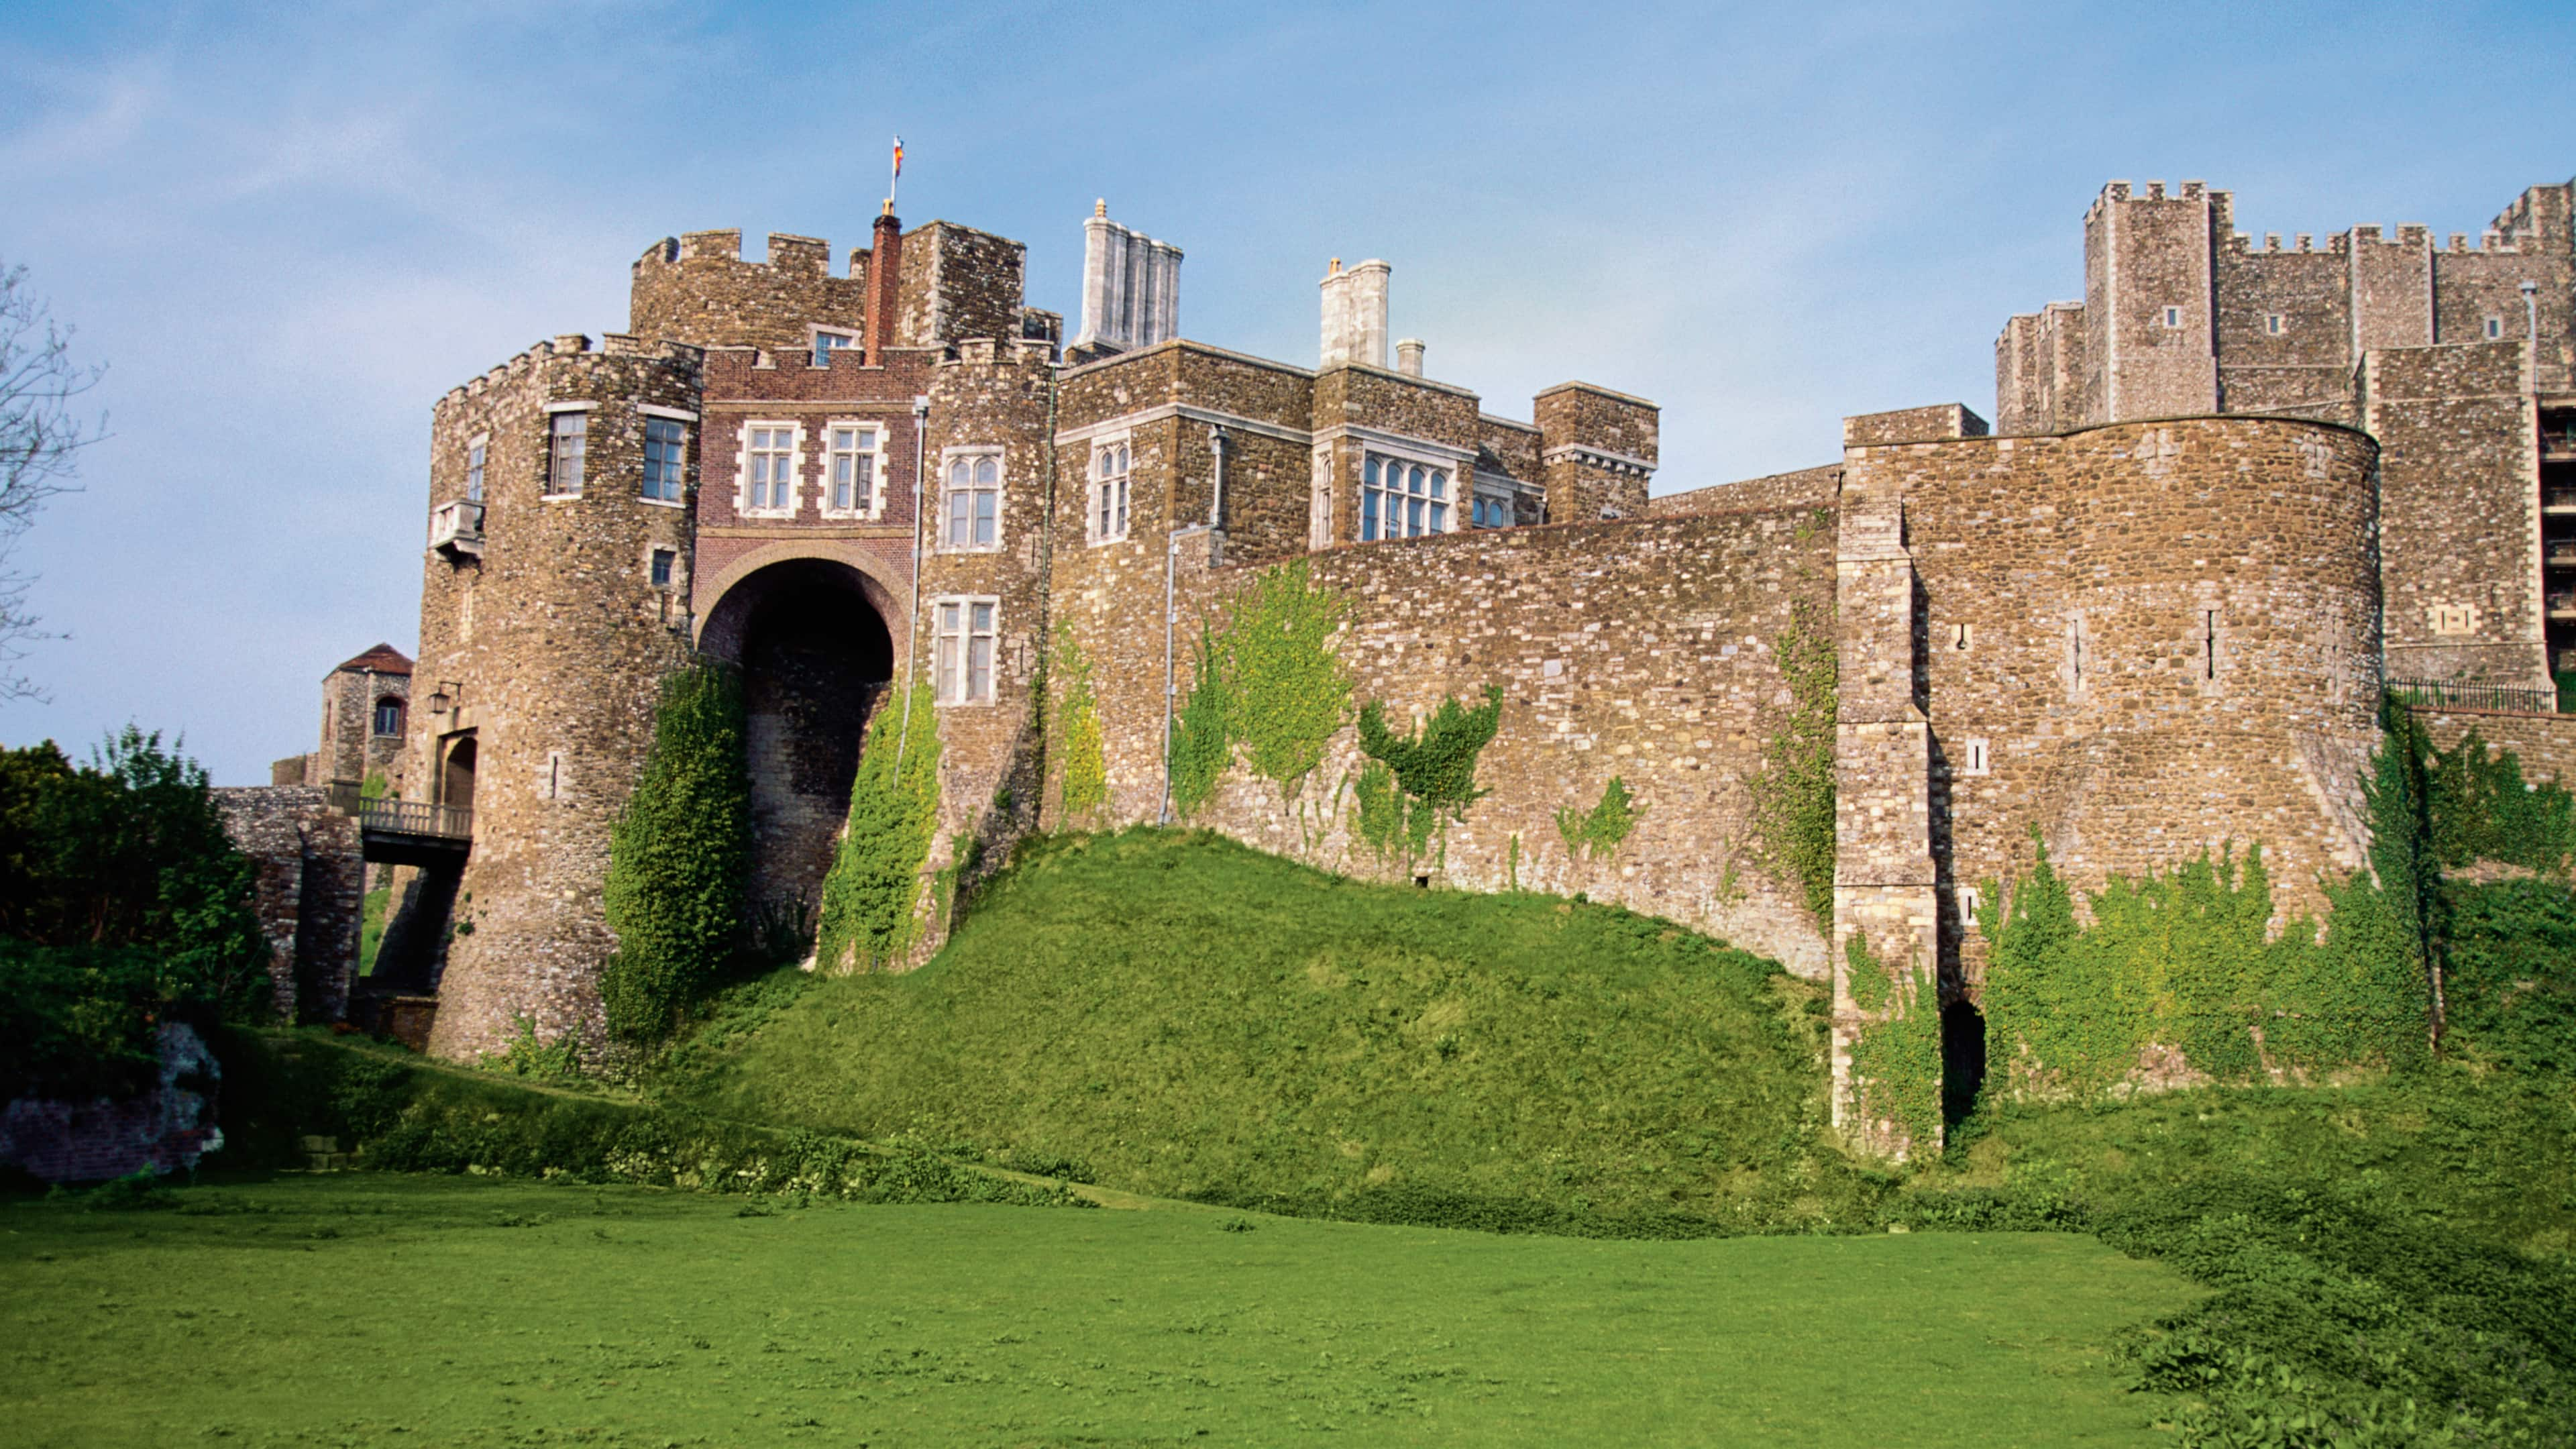 Hera crescendo nas muralhas do castelo medieval de Dover, na Inglaterra.